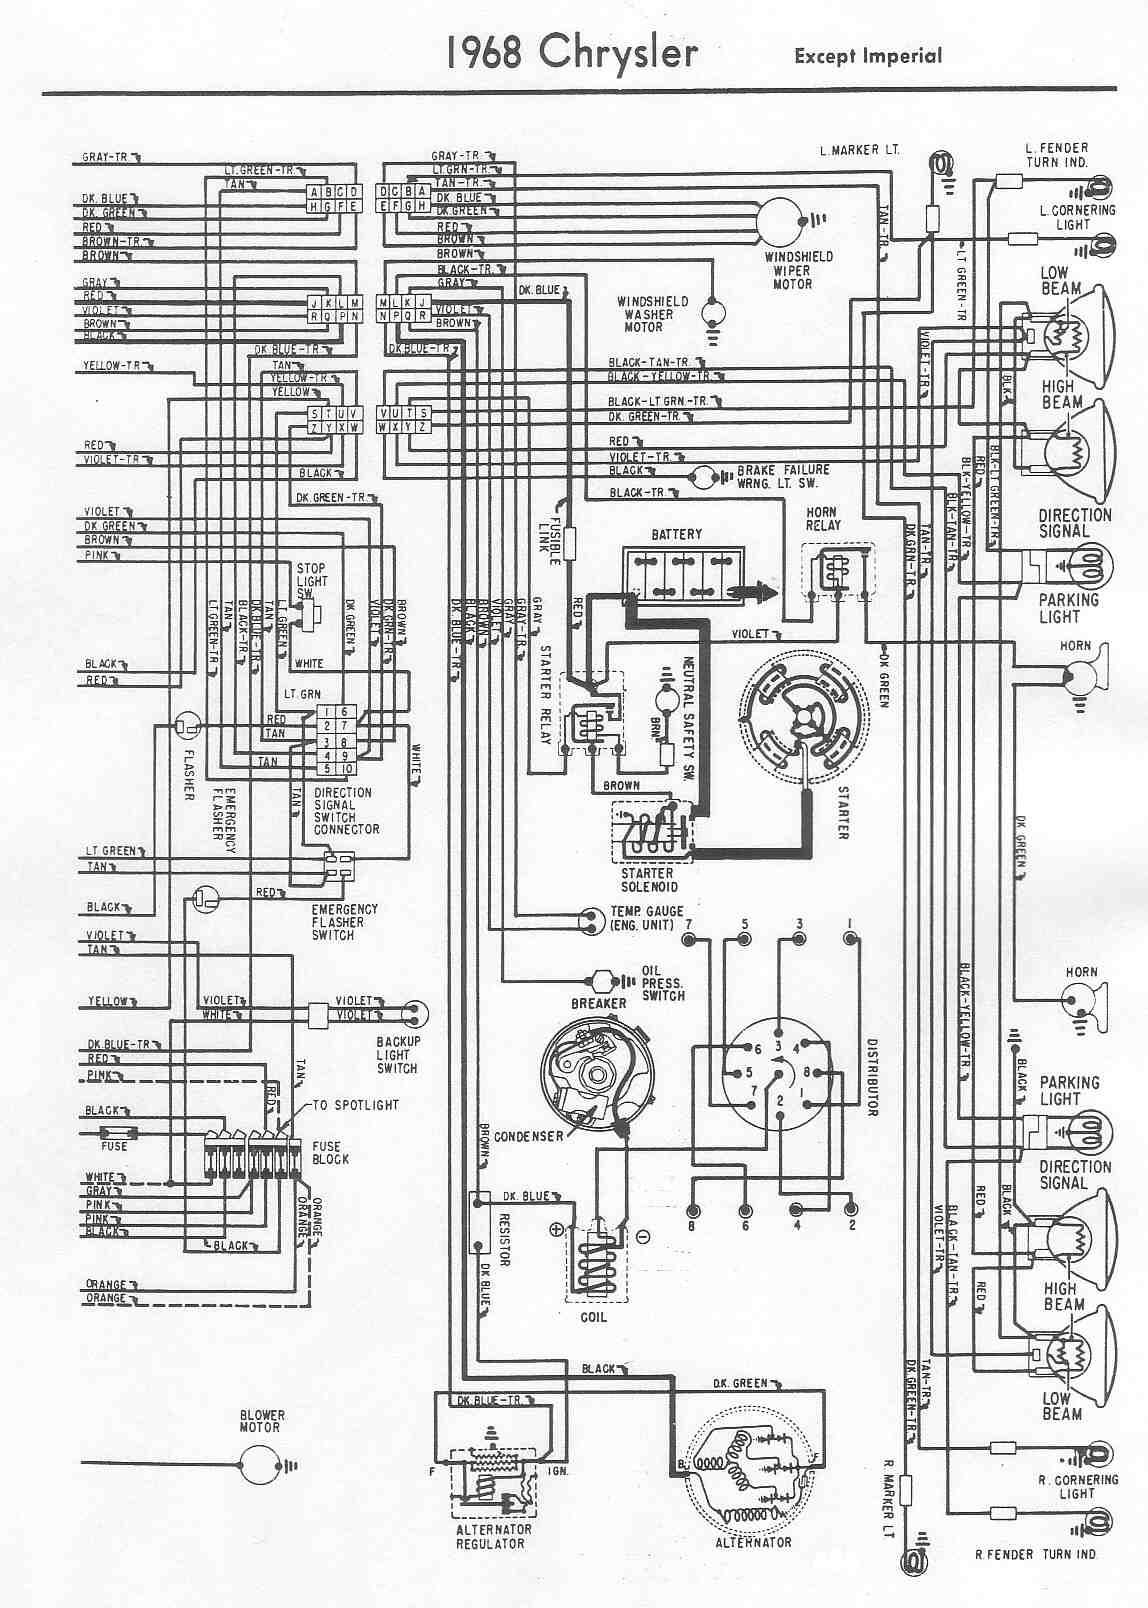 1965 dodge coronet wiring diagram wiring diagram third level rh 10 12 12 jacobwinterstein com 1970 [ 1148 x 1608 Pixel ]